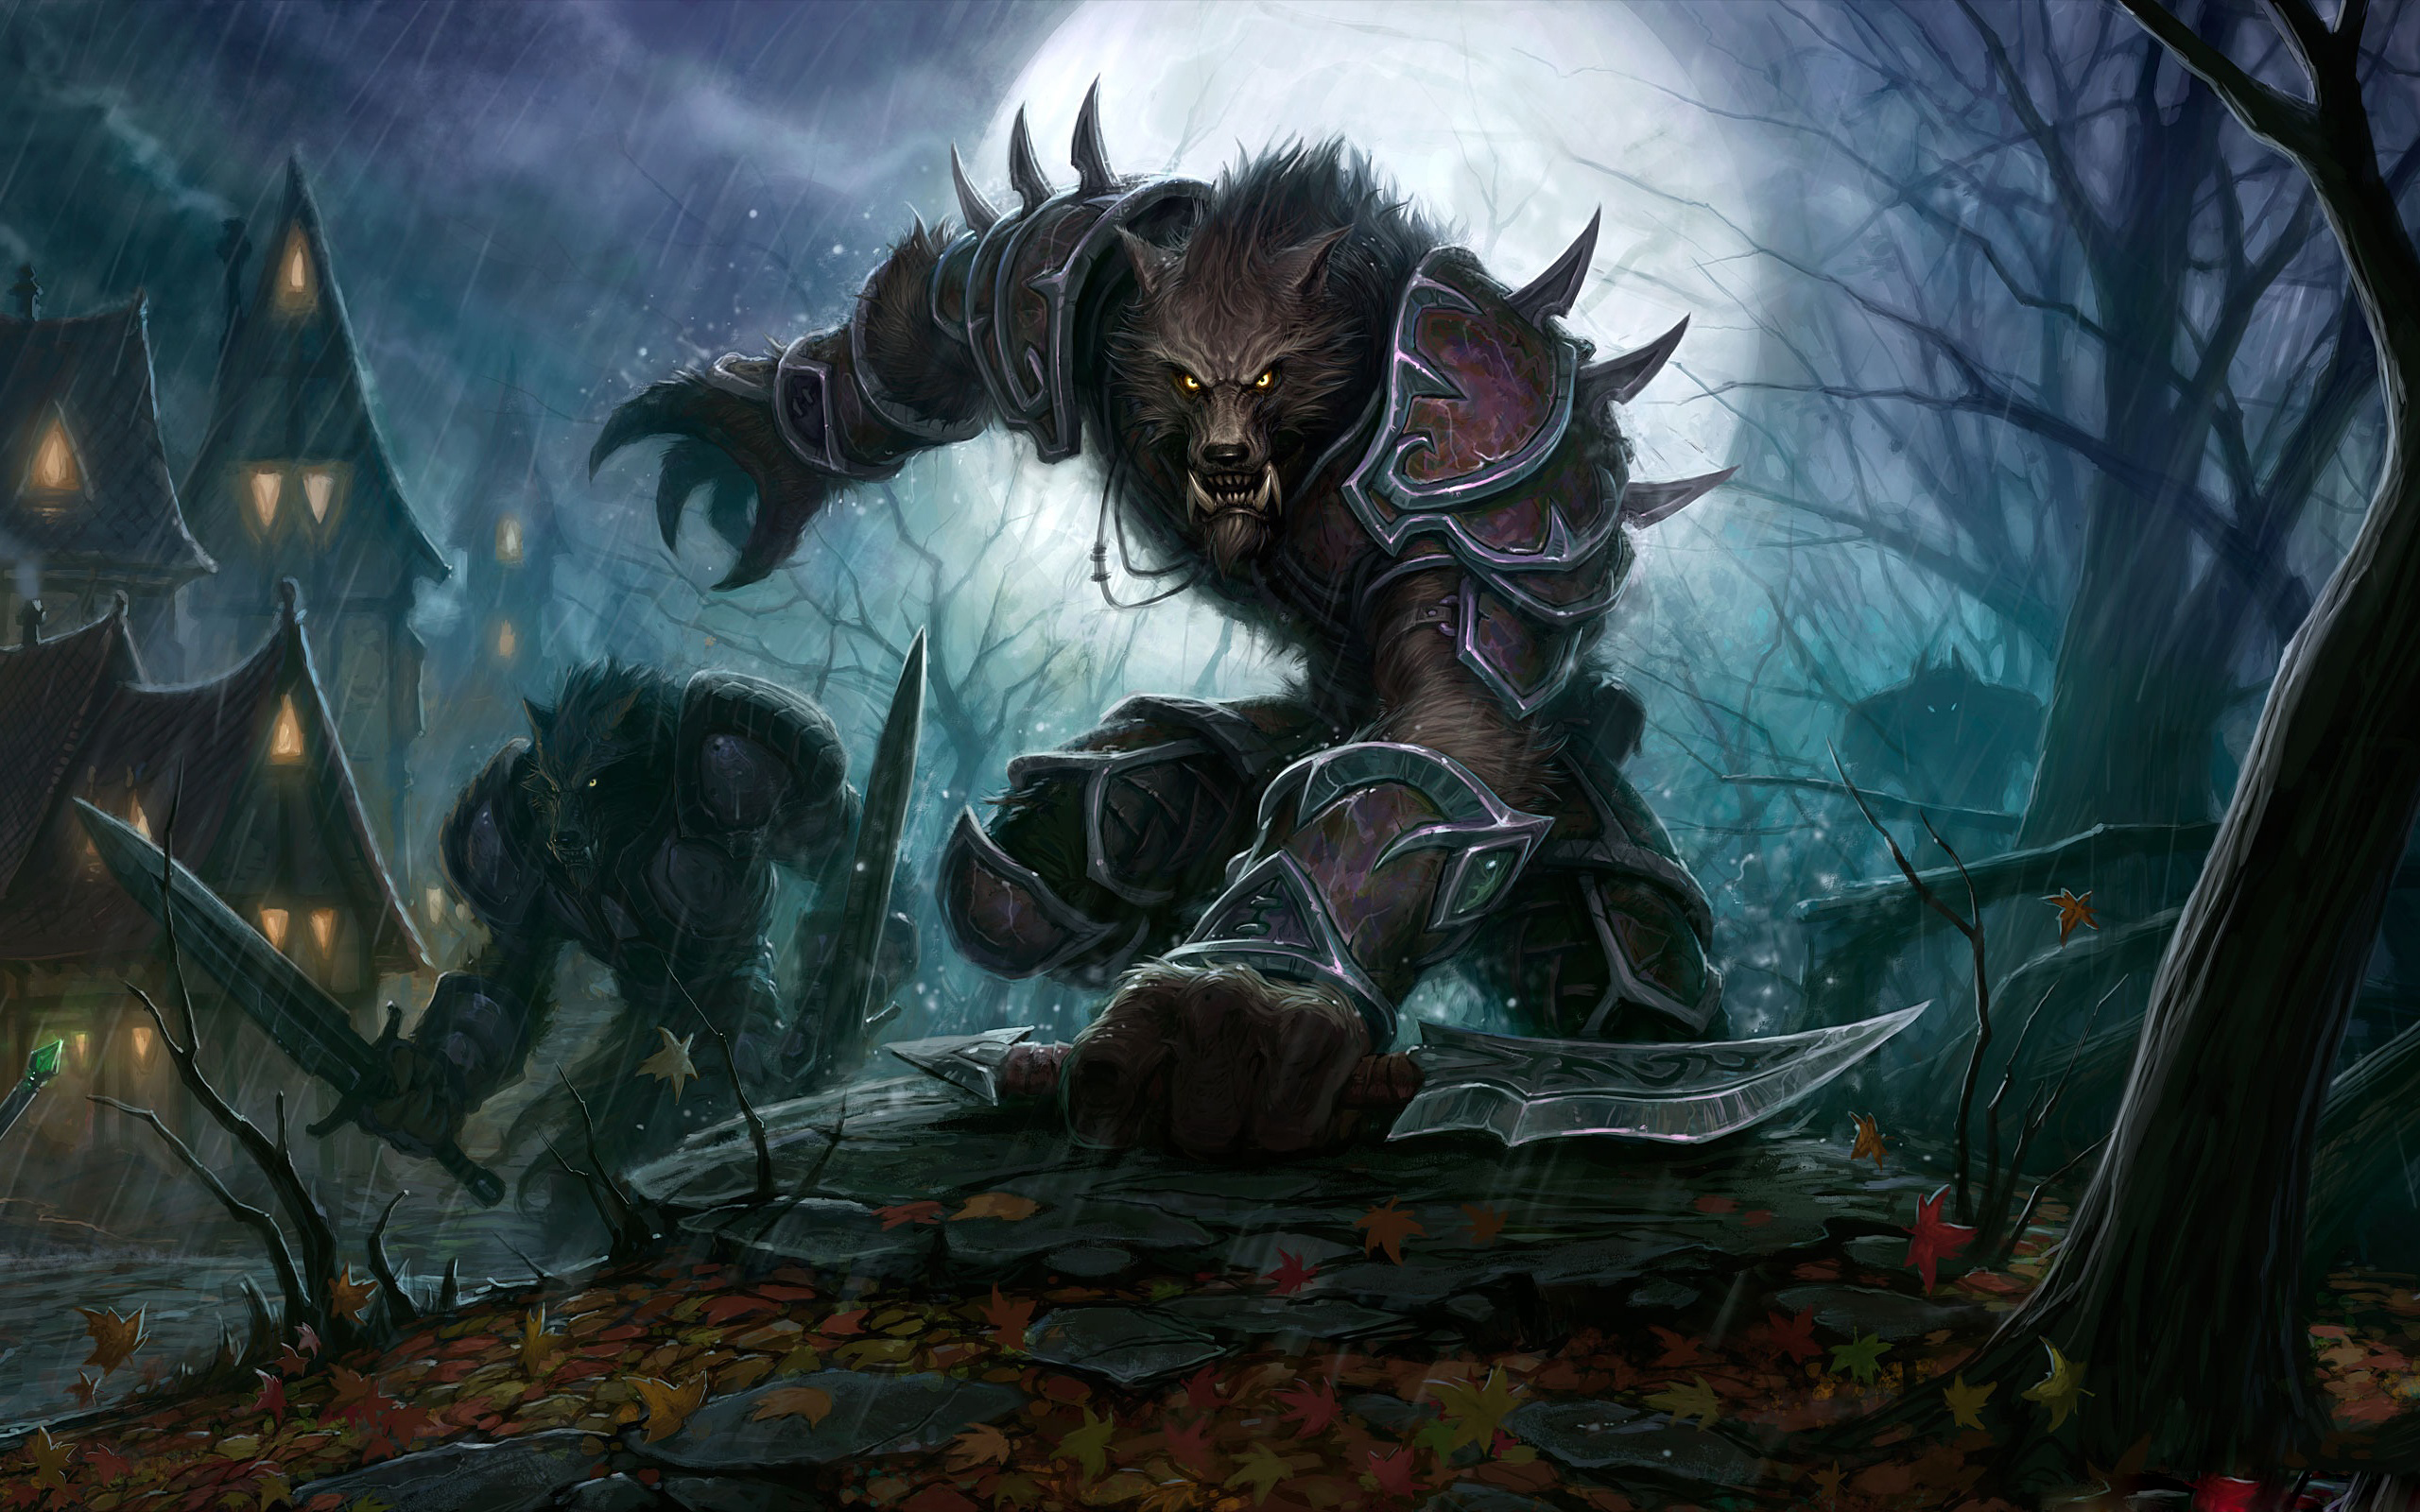 Lich King Iphone Wallpaper World Of Warcraft Wallpapers High Quality Pixelstalk Net